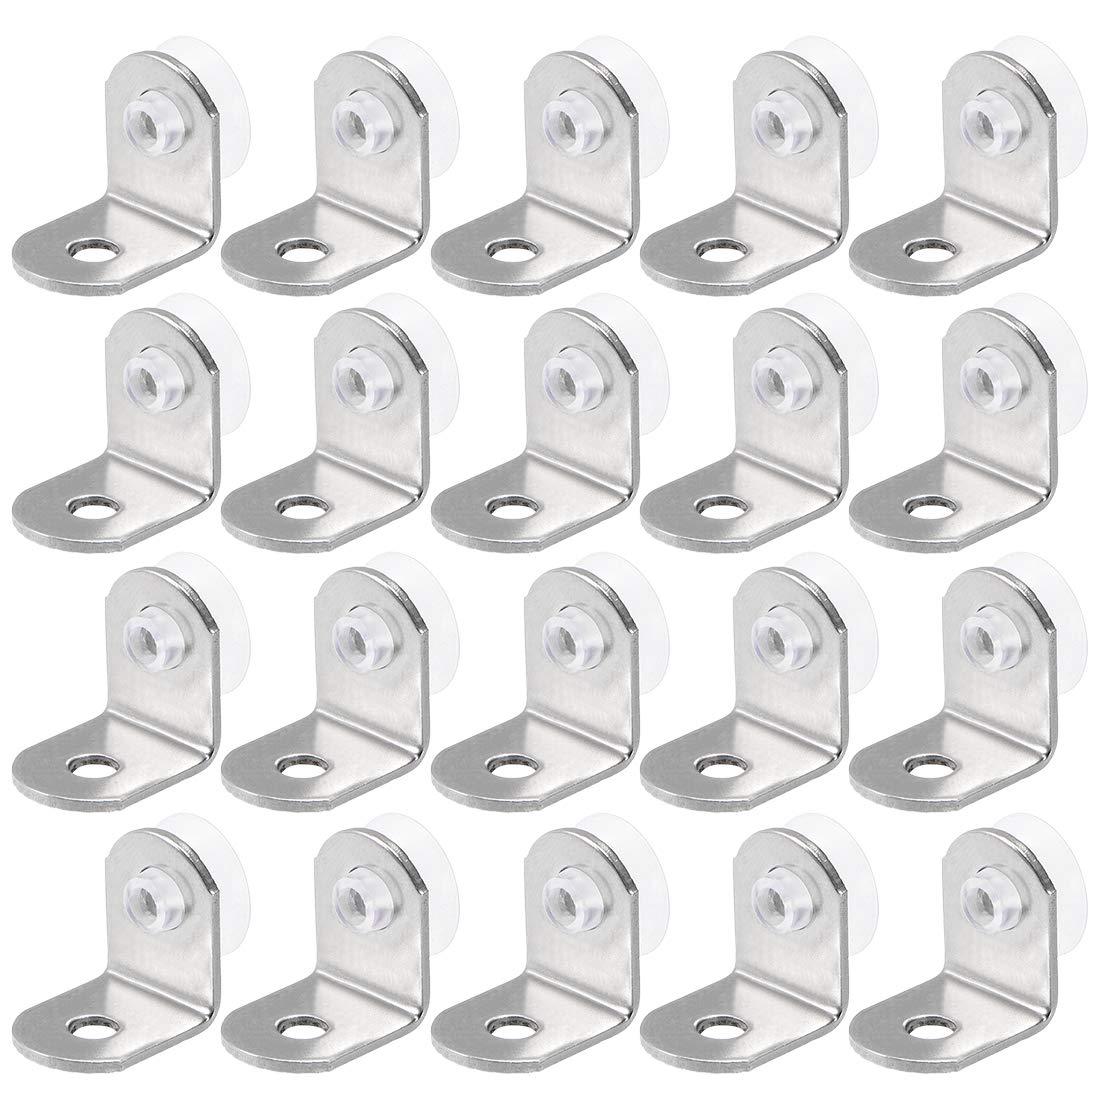 uxcell Shelf Pegs Cabinet Shelf Clips Shelf Holder Pins for Cabinet Furniture Book Shelves Supplies 10pcs